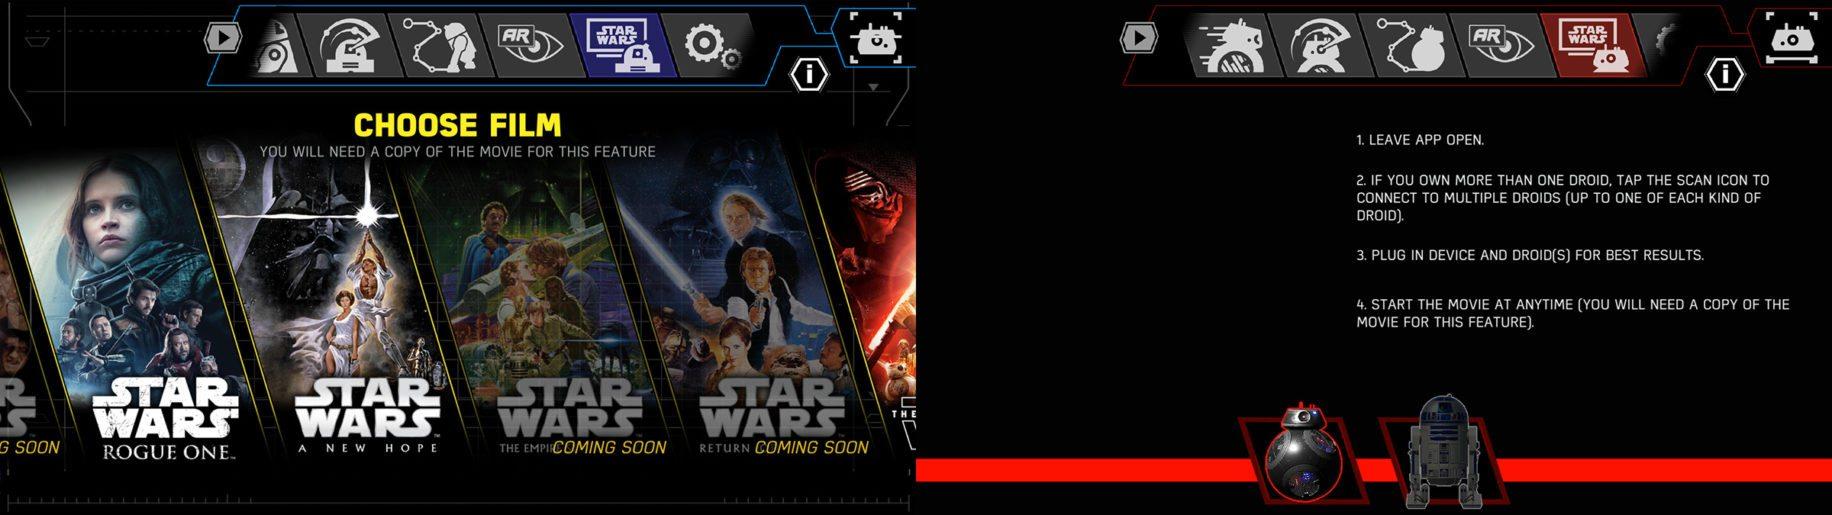 watch with me screenshot